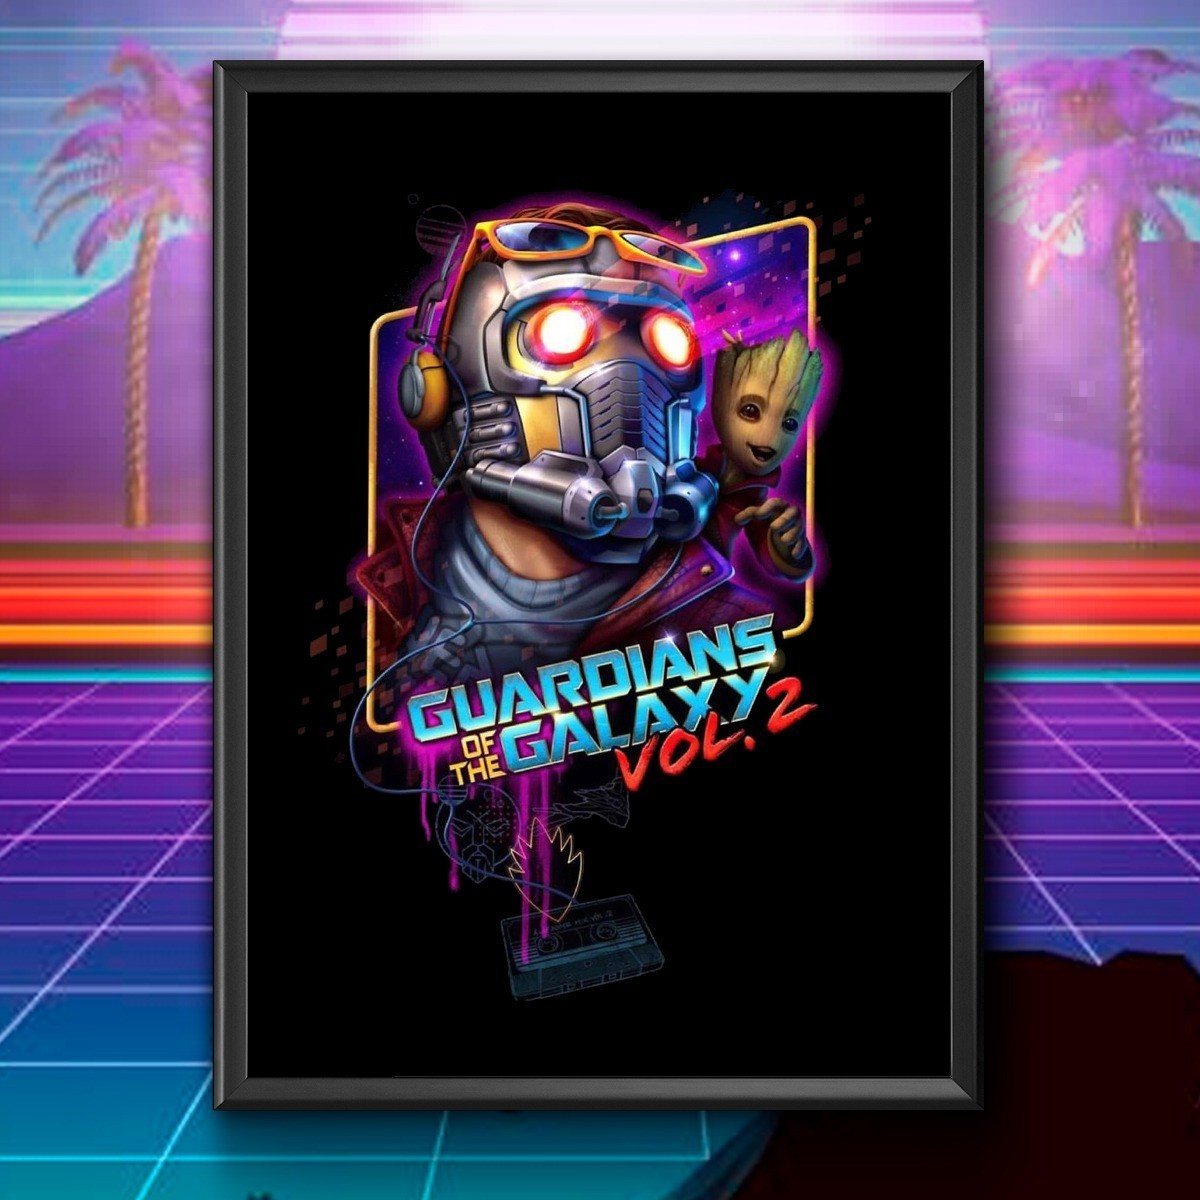 Quadro: Guardians Of The Galaxy Vol, 2